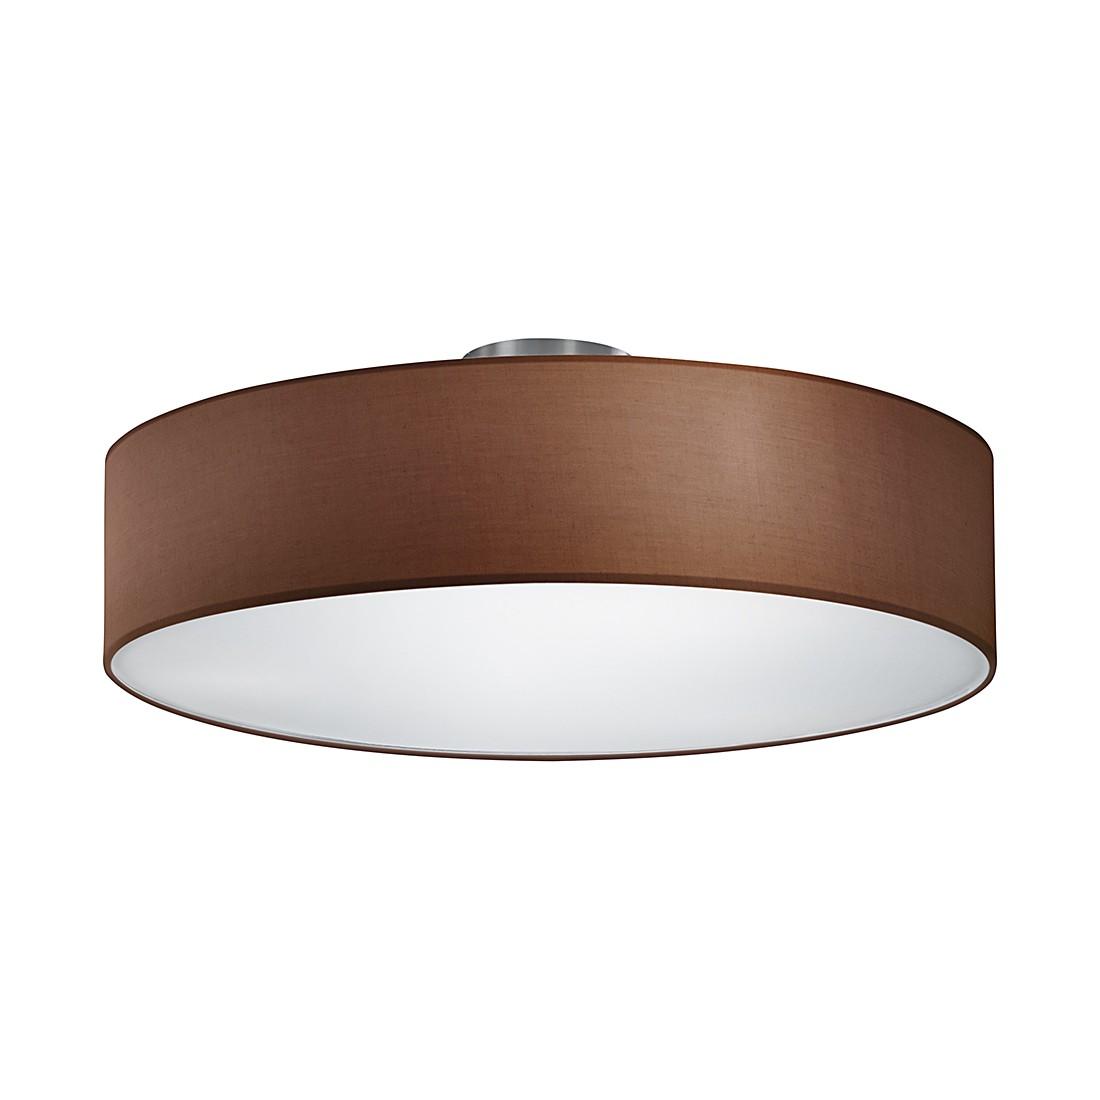 energie  A++, Plafondlamp - nikkelkleurig/bruin 3 lichtbronnen, Trio